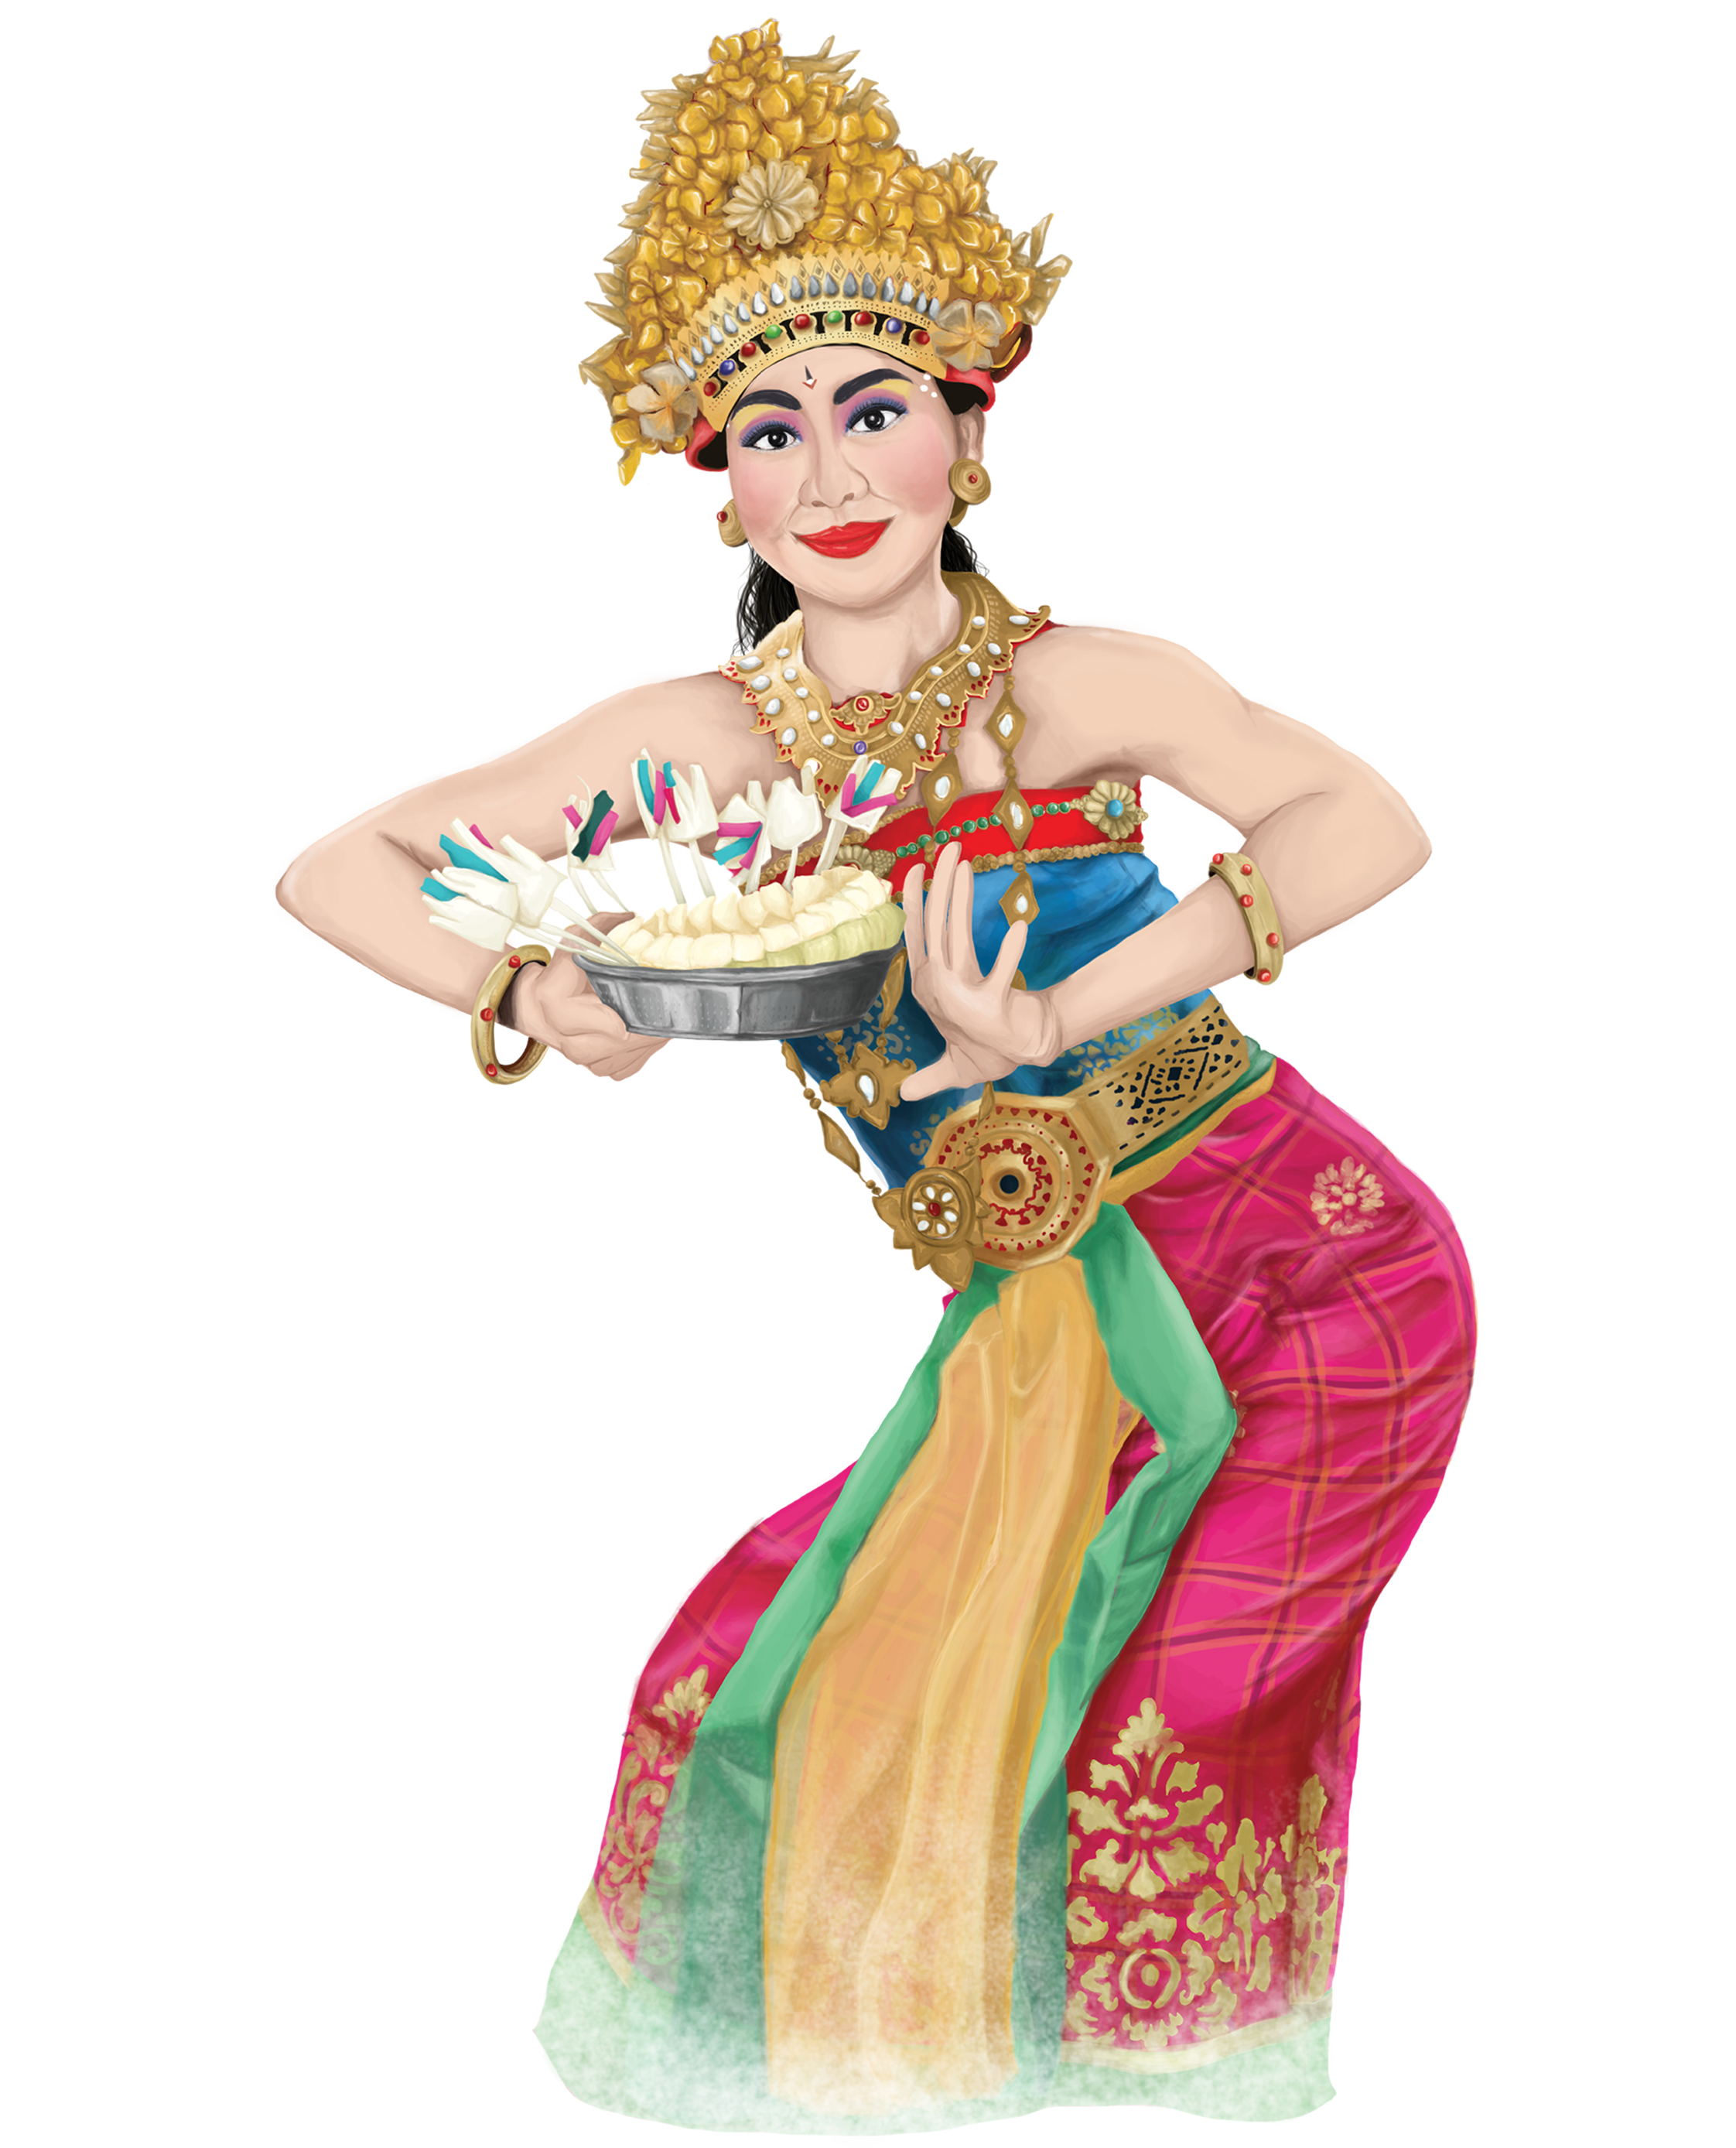 Digital Painting of Bali dancer, Indonesia. Proud to